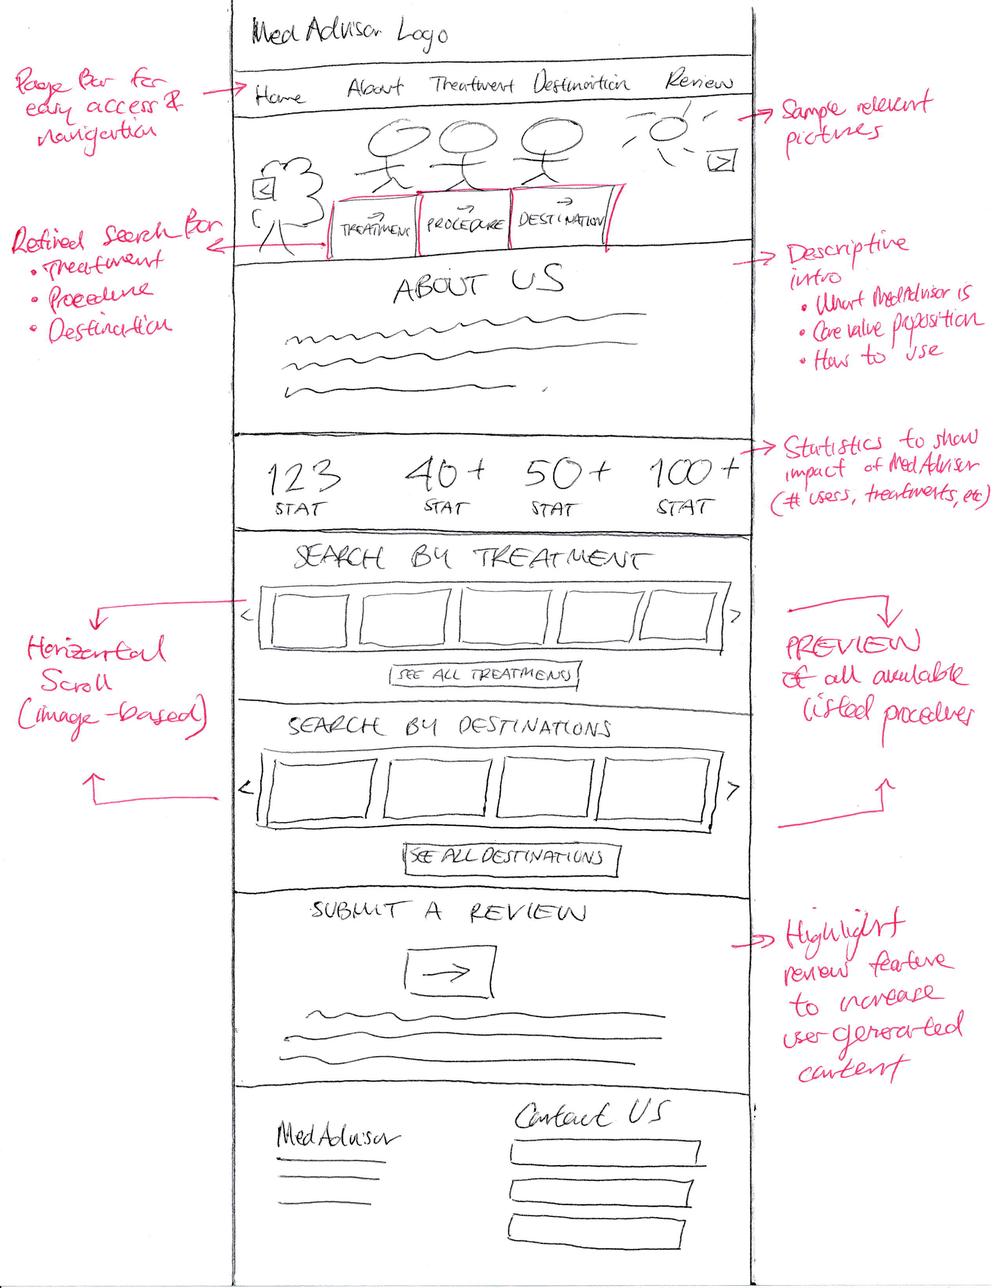 Sketch - Homepage Design.png